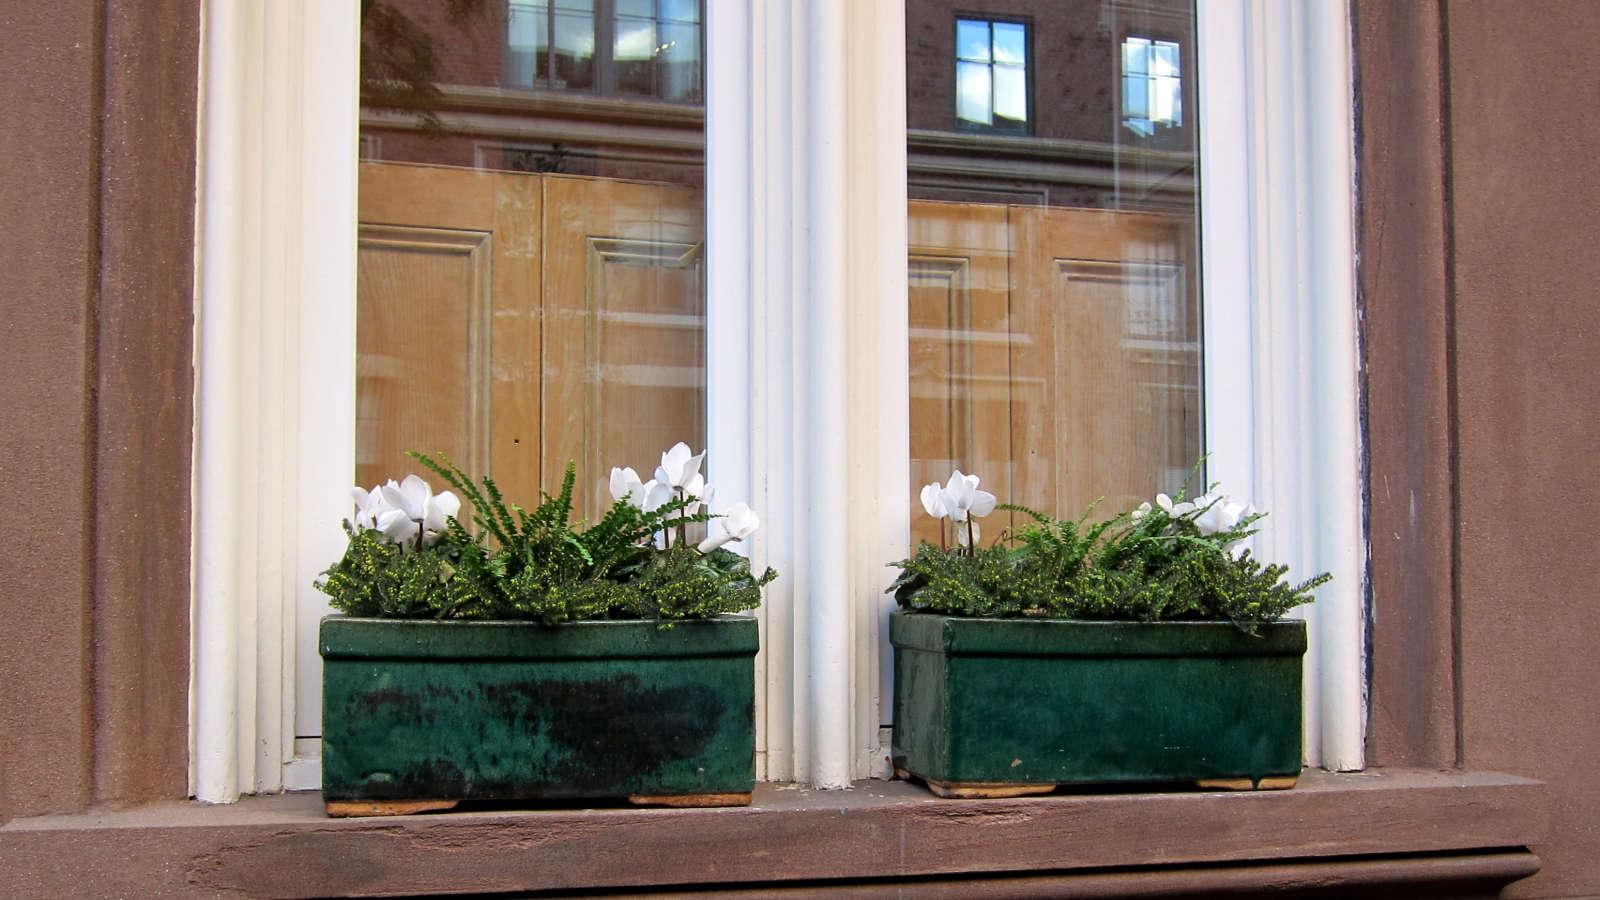 In temperate weather, button ferns are happyon a windowsill in Manhattan&#8